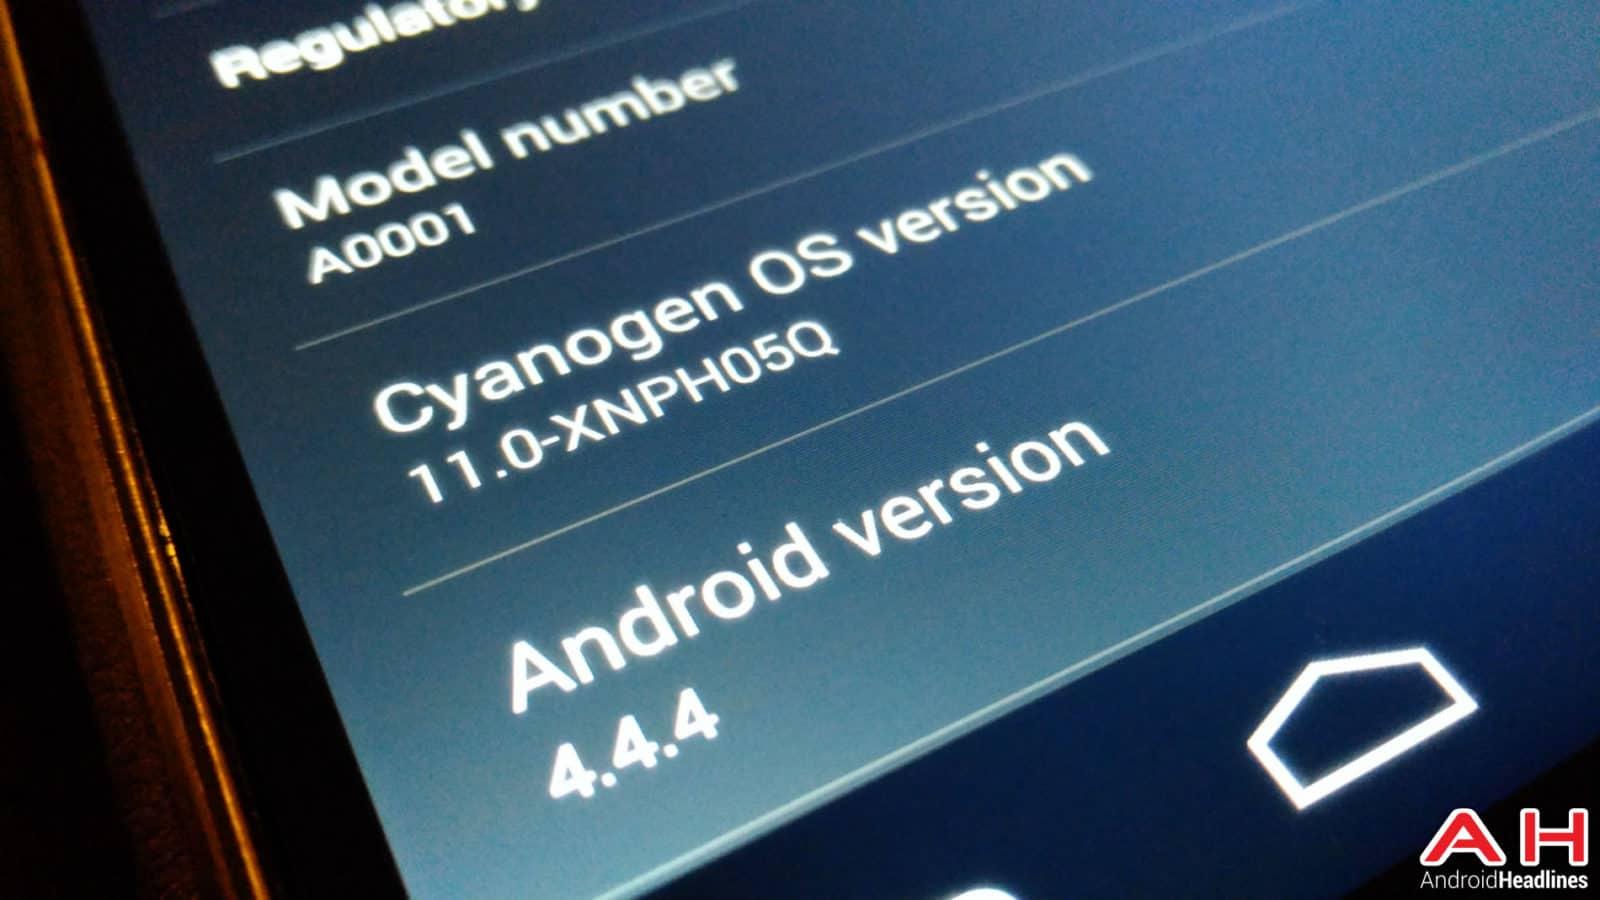 OnePlus 4.4 AH